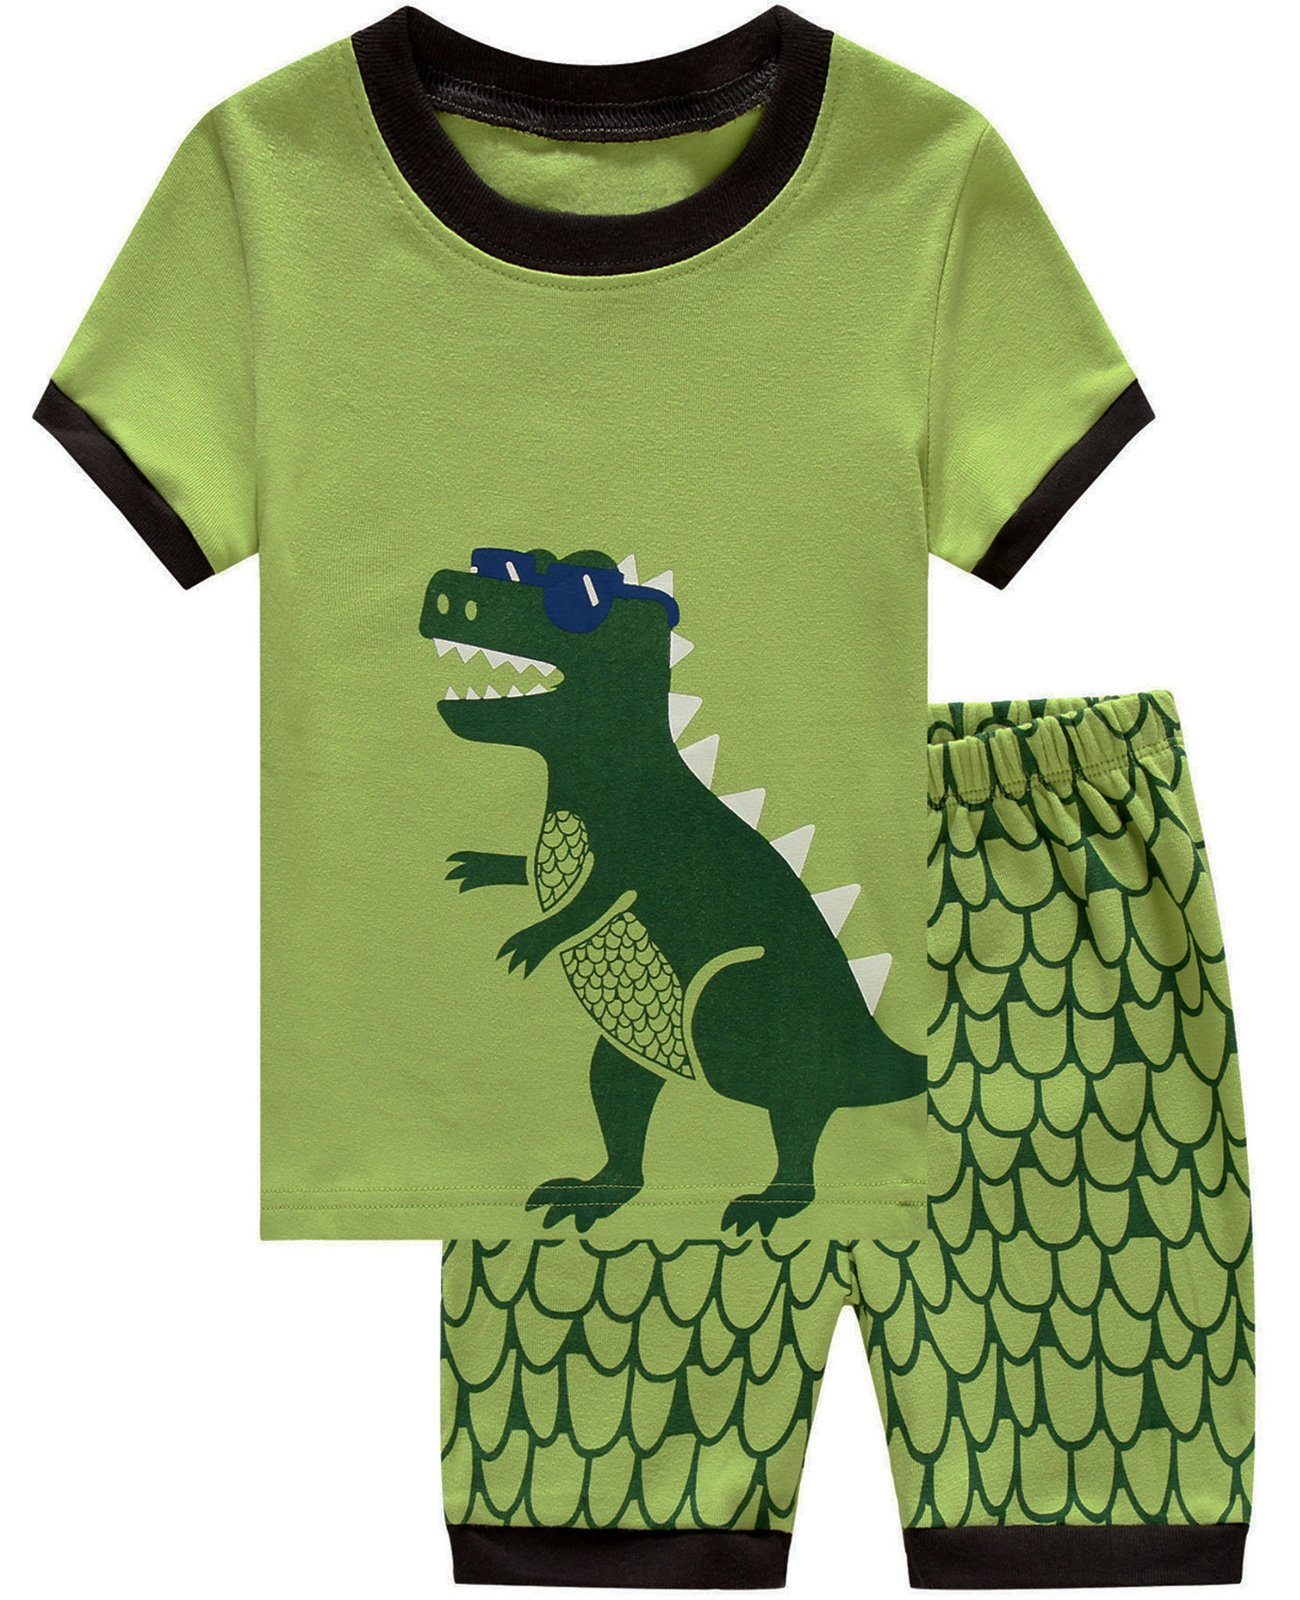 Babyroom Boys Short Pajamas Toddler Kids Sleepwear Summer Clothes Shirts 6T by Babyroom (Image #1)